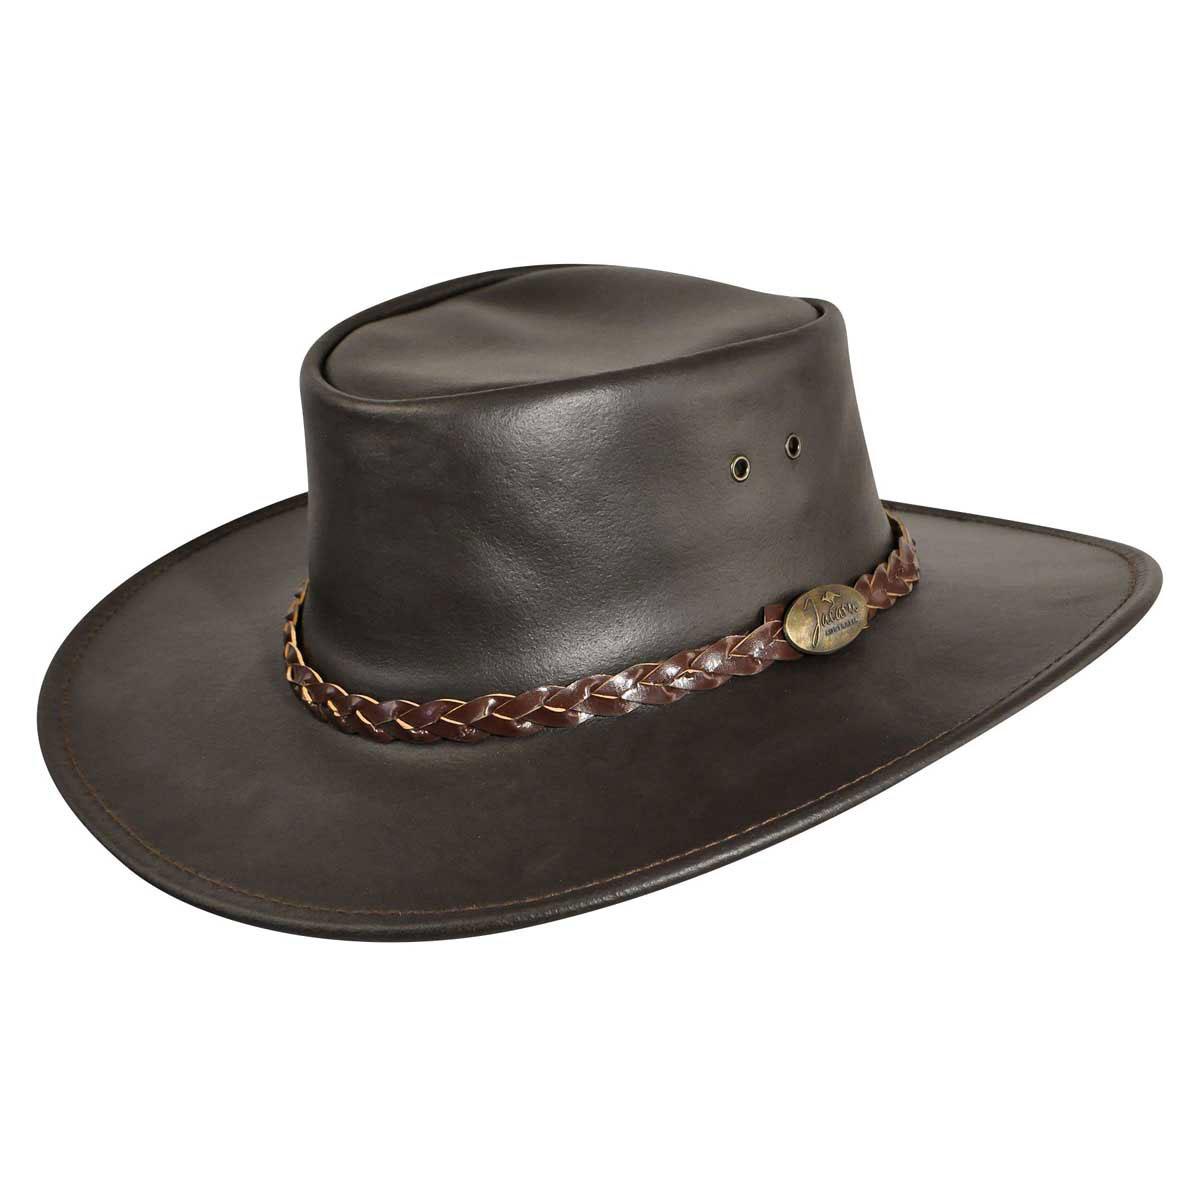 Jacaru Swagman Outback Hat in Brown